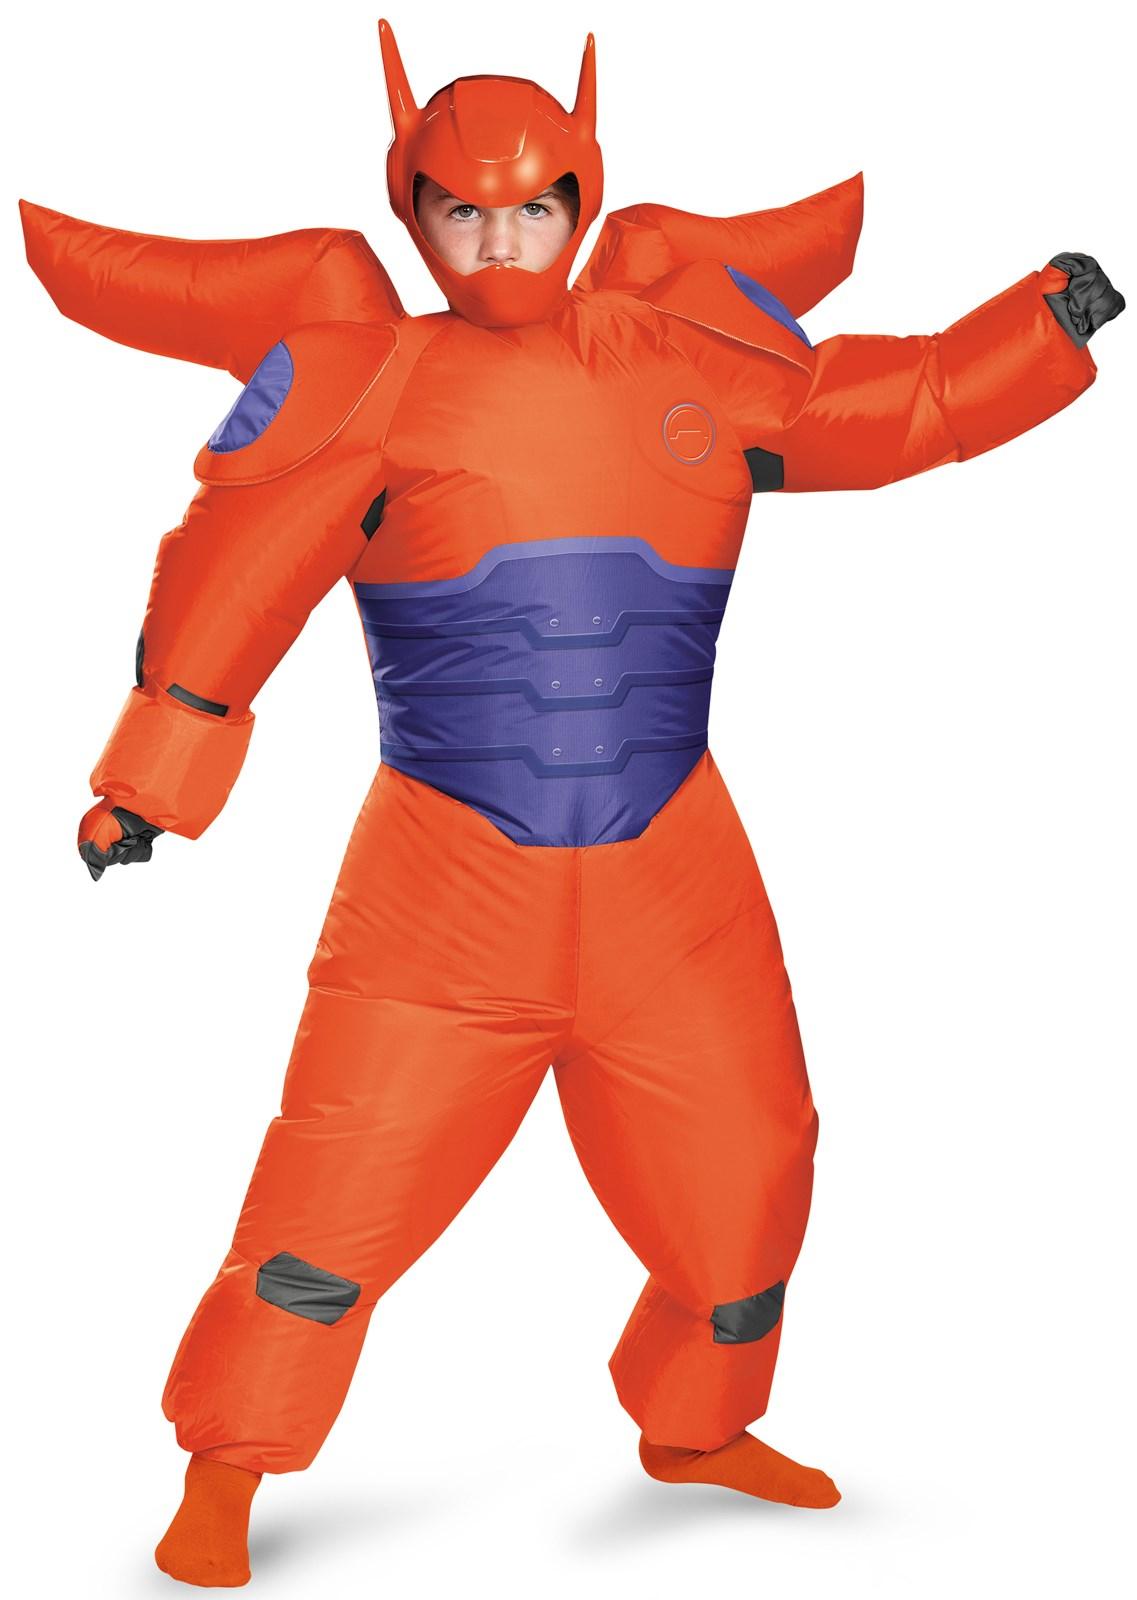 Big Hero 6: Red Baymax Inflatable Costume For Kids | BuyCostumes.com